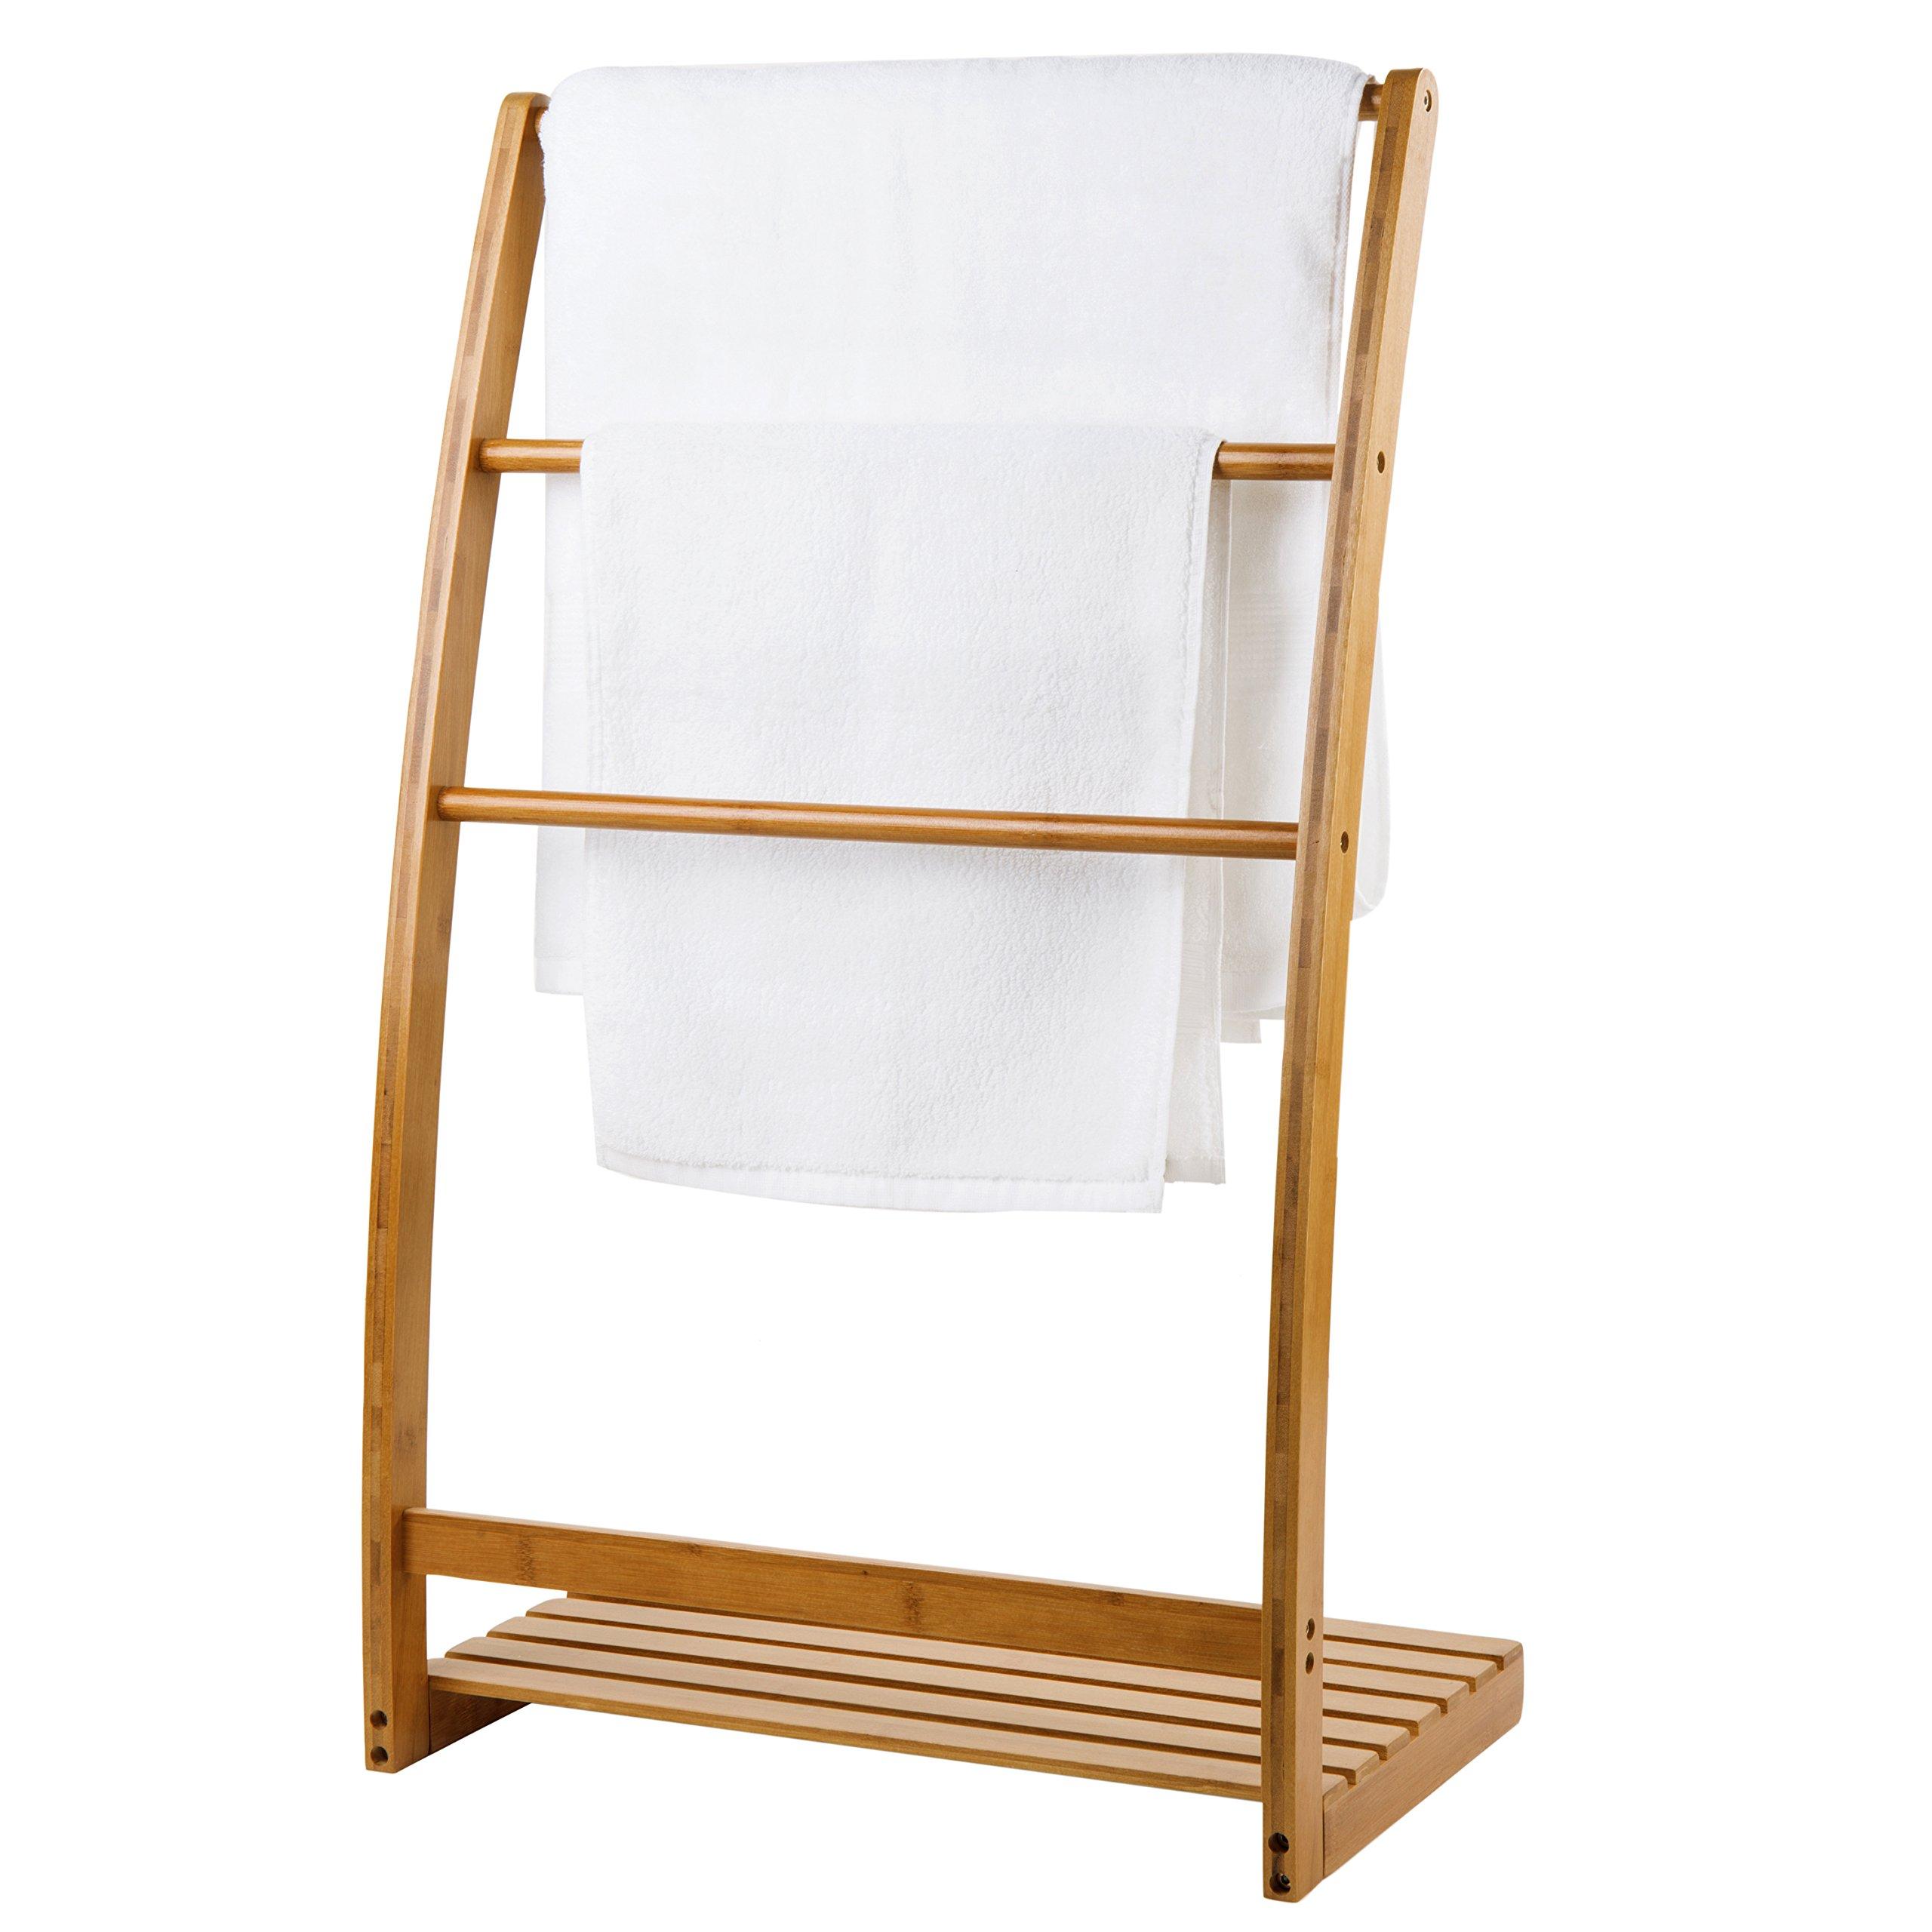 MyGift 33-Inch Freestanding Bamboo 3-Bar Towel Rack with Shelf